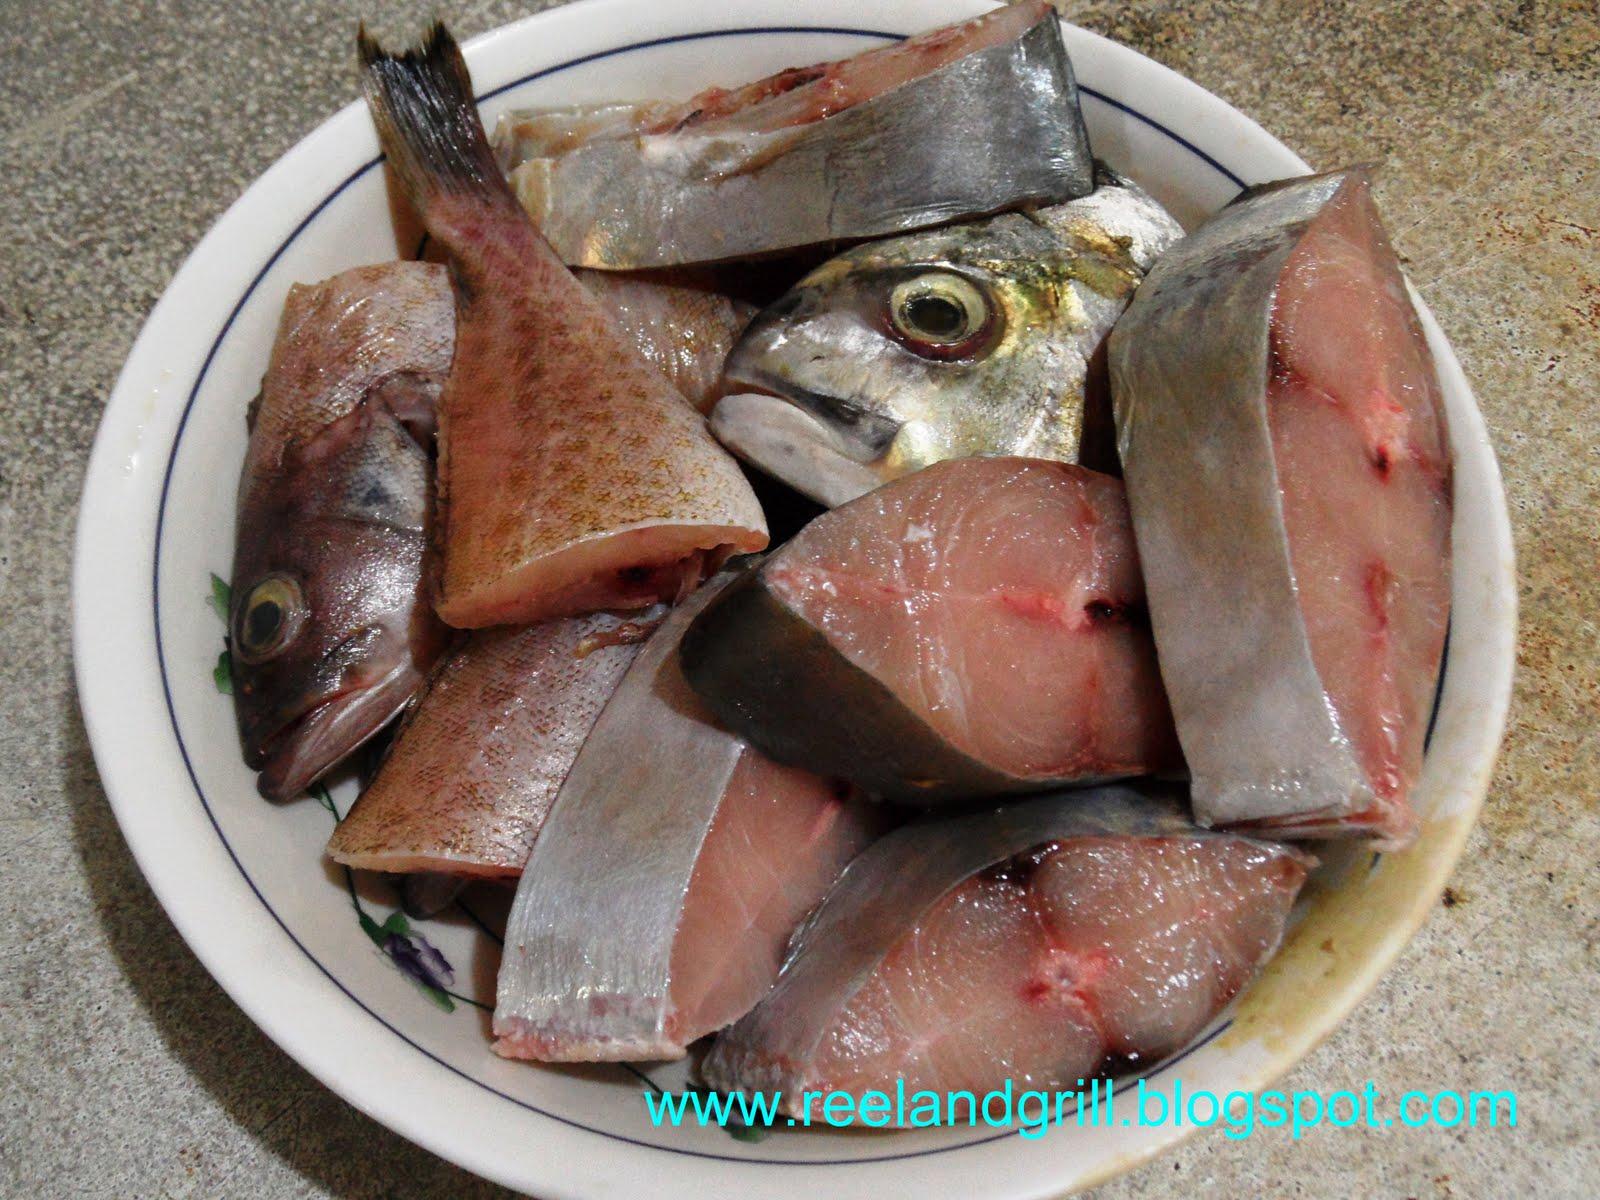 Reel and grill paksiw na lapu lapu at talakitok grouper for Serving size of fish